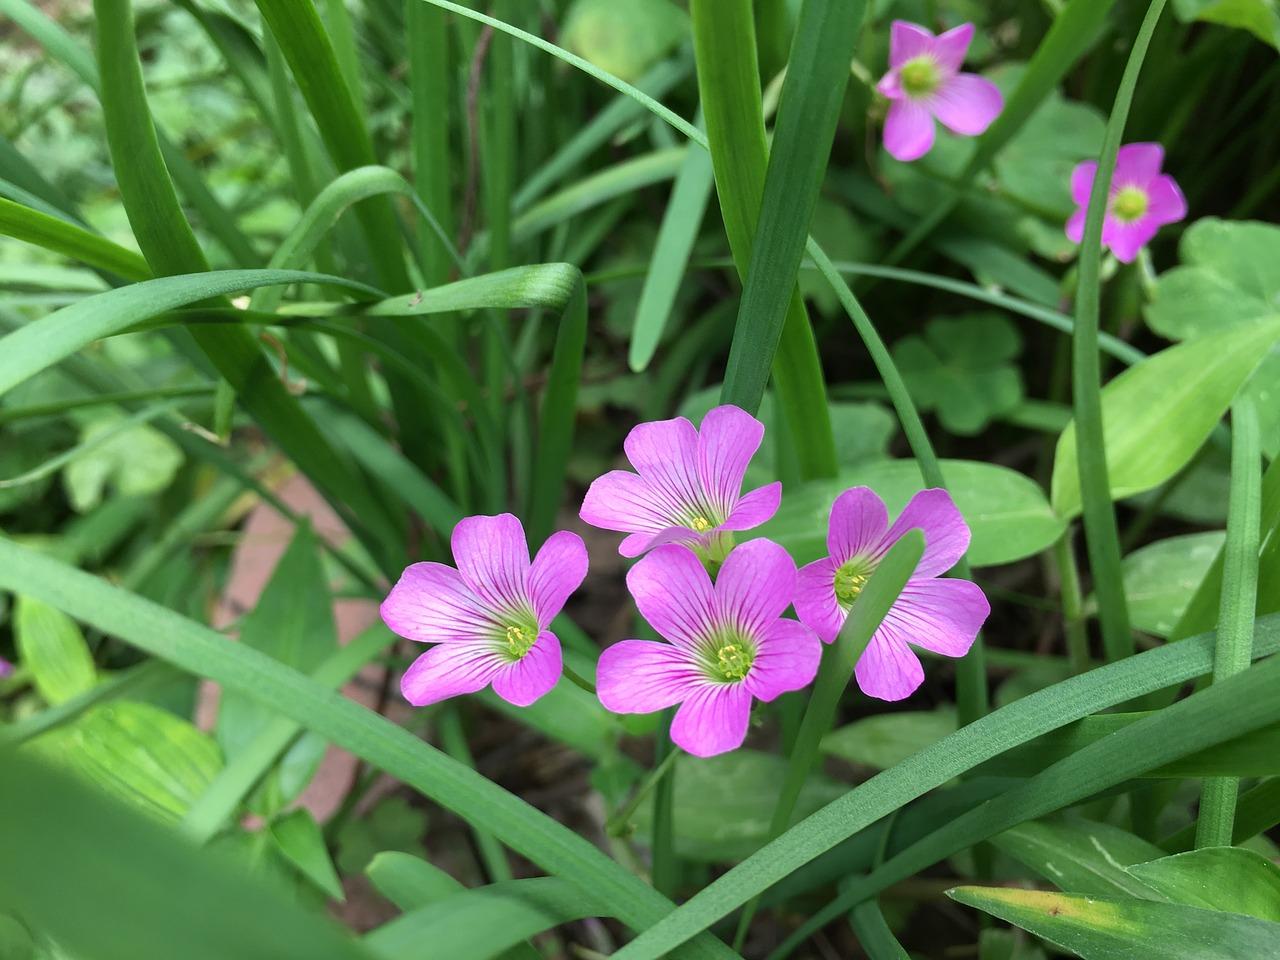 Littlepinkflowers Free Photo From Needpix